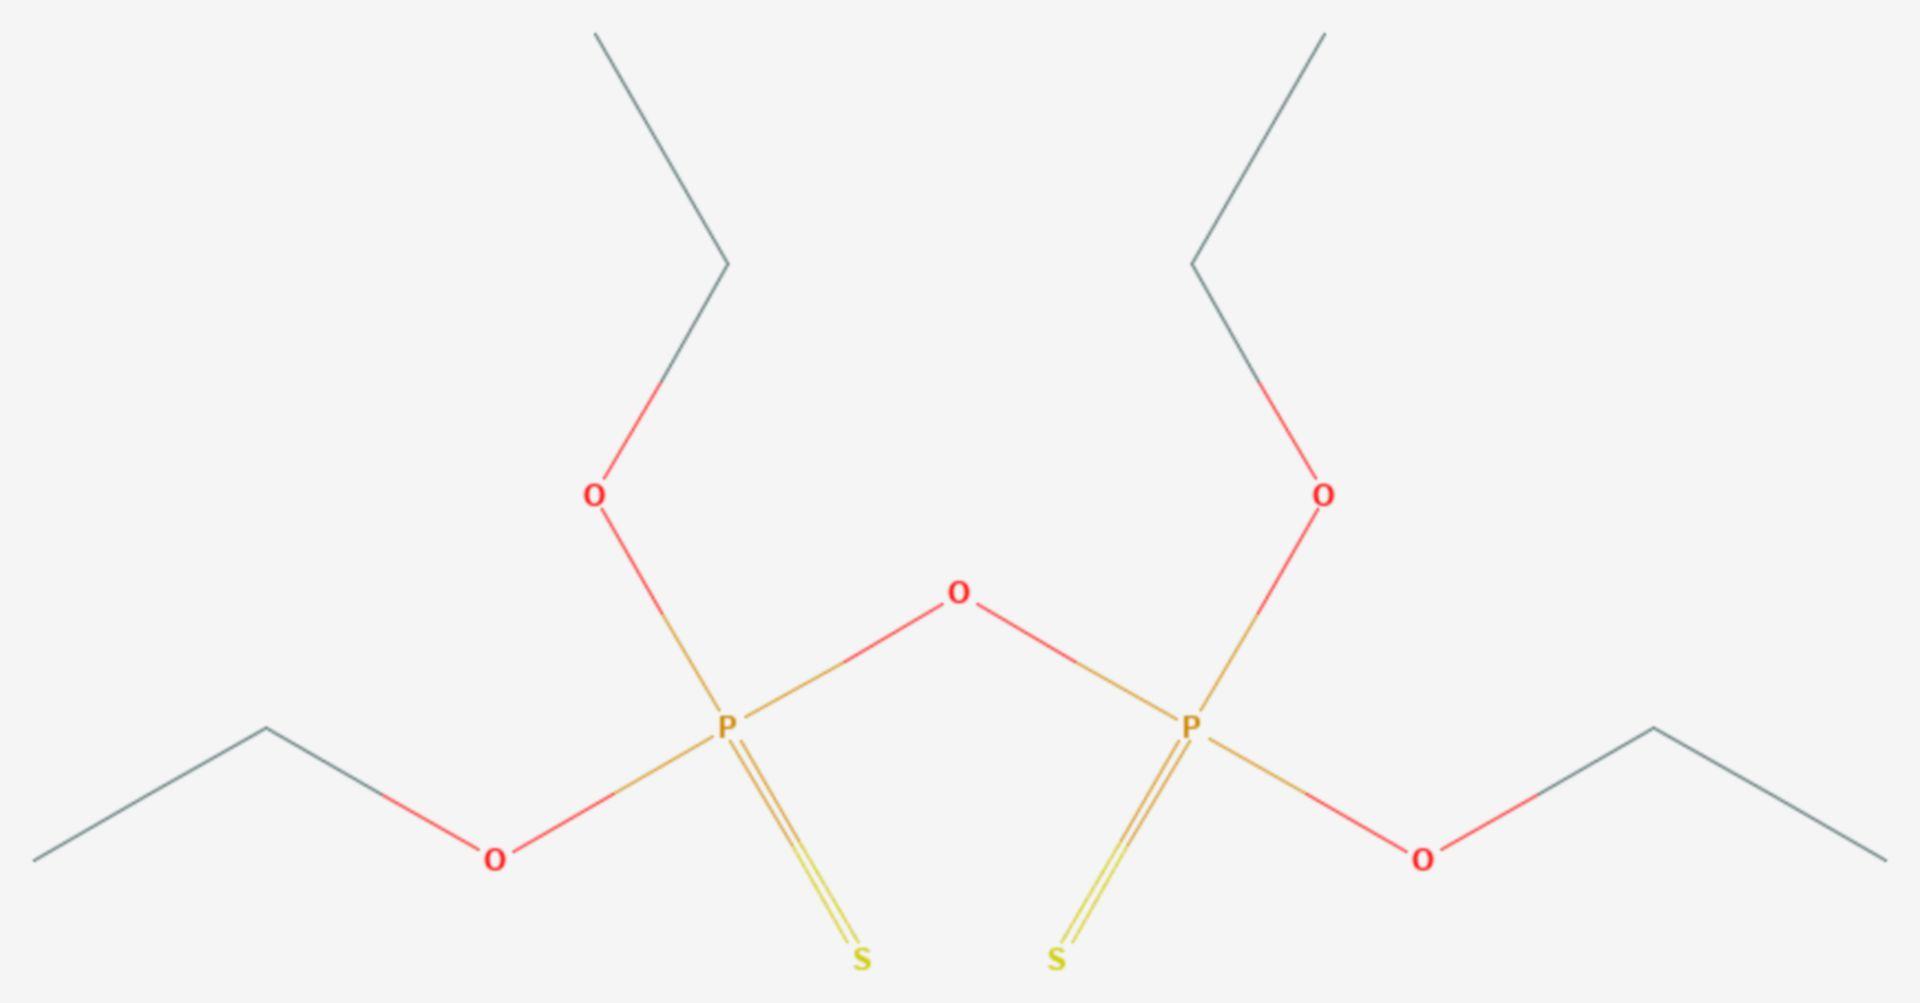 Sulfotep (Strukturformel)